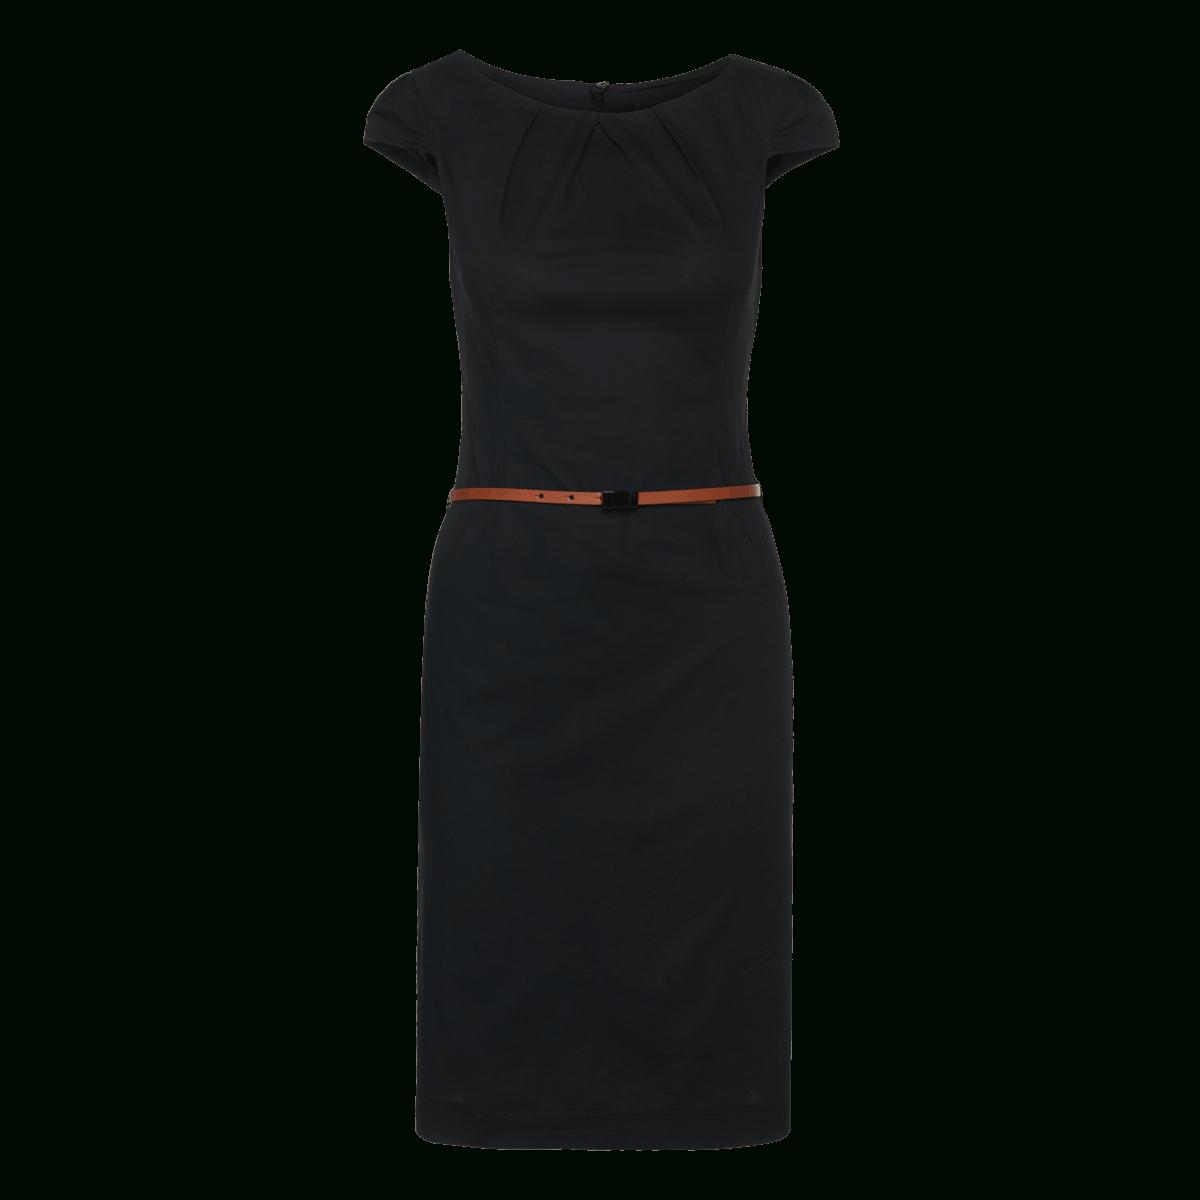 15 Großartig Abendkleid Zero Design Elegant Abendkleid Zero Design